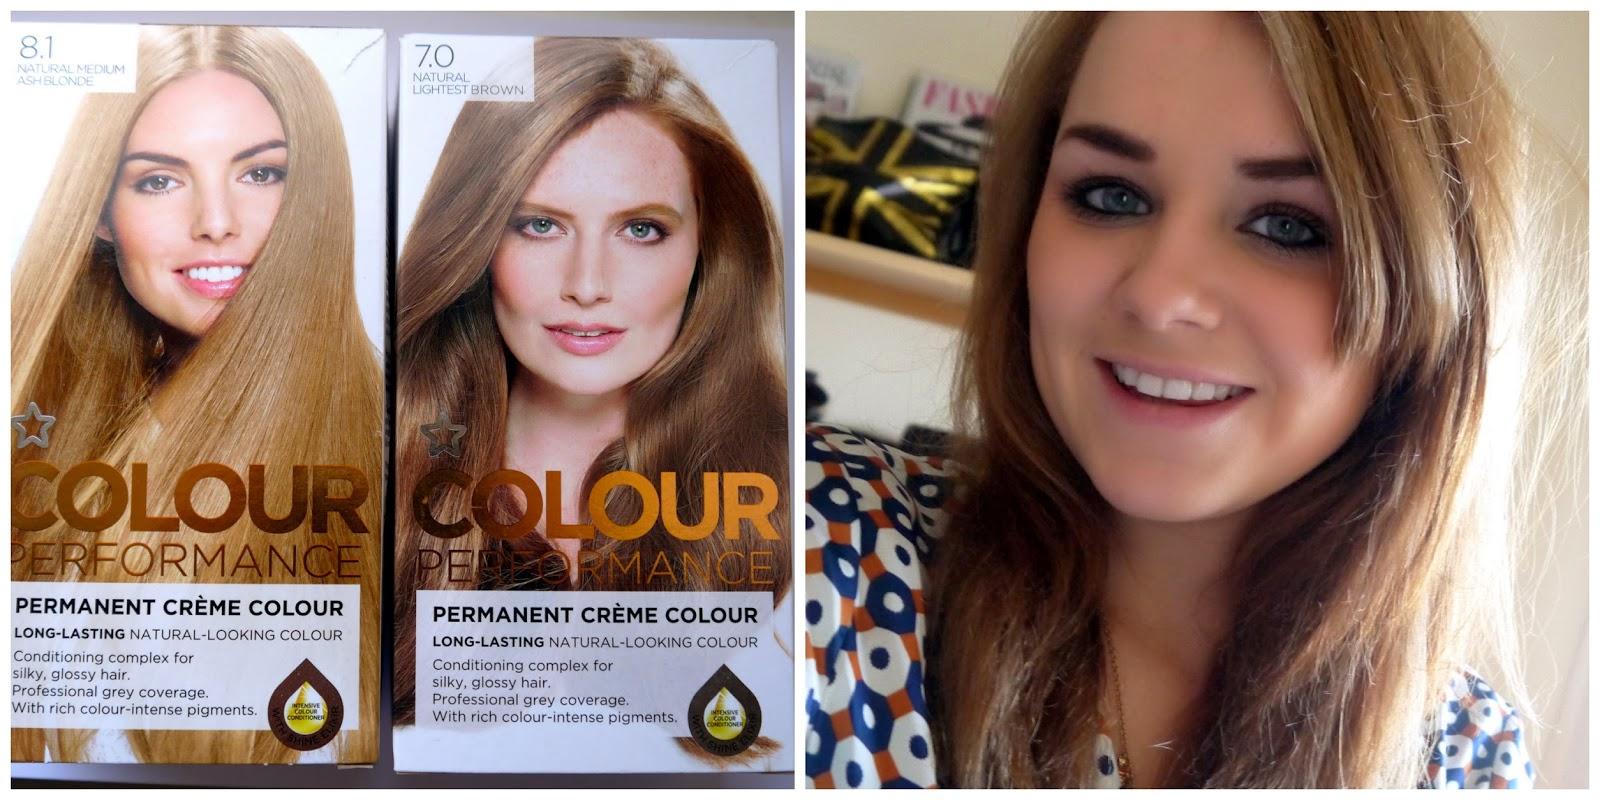 How to achieve Lauren Conrad's hair colour